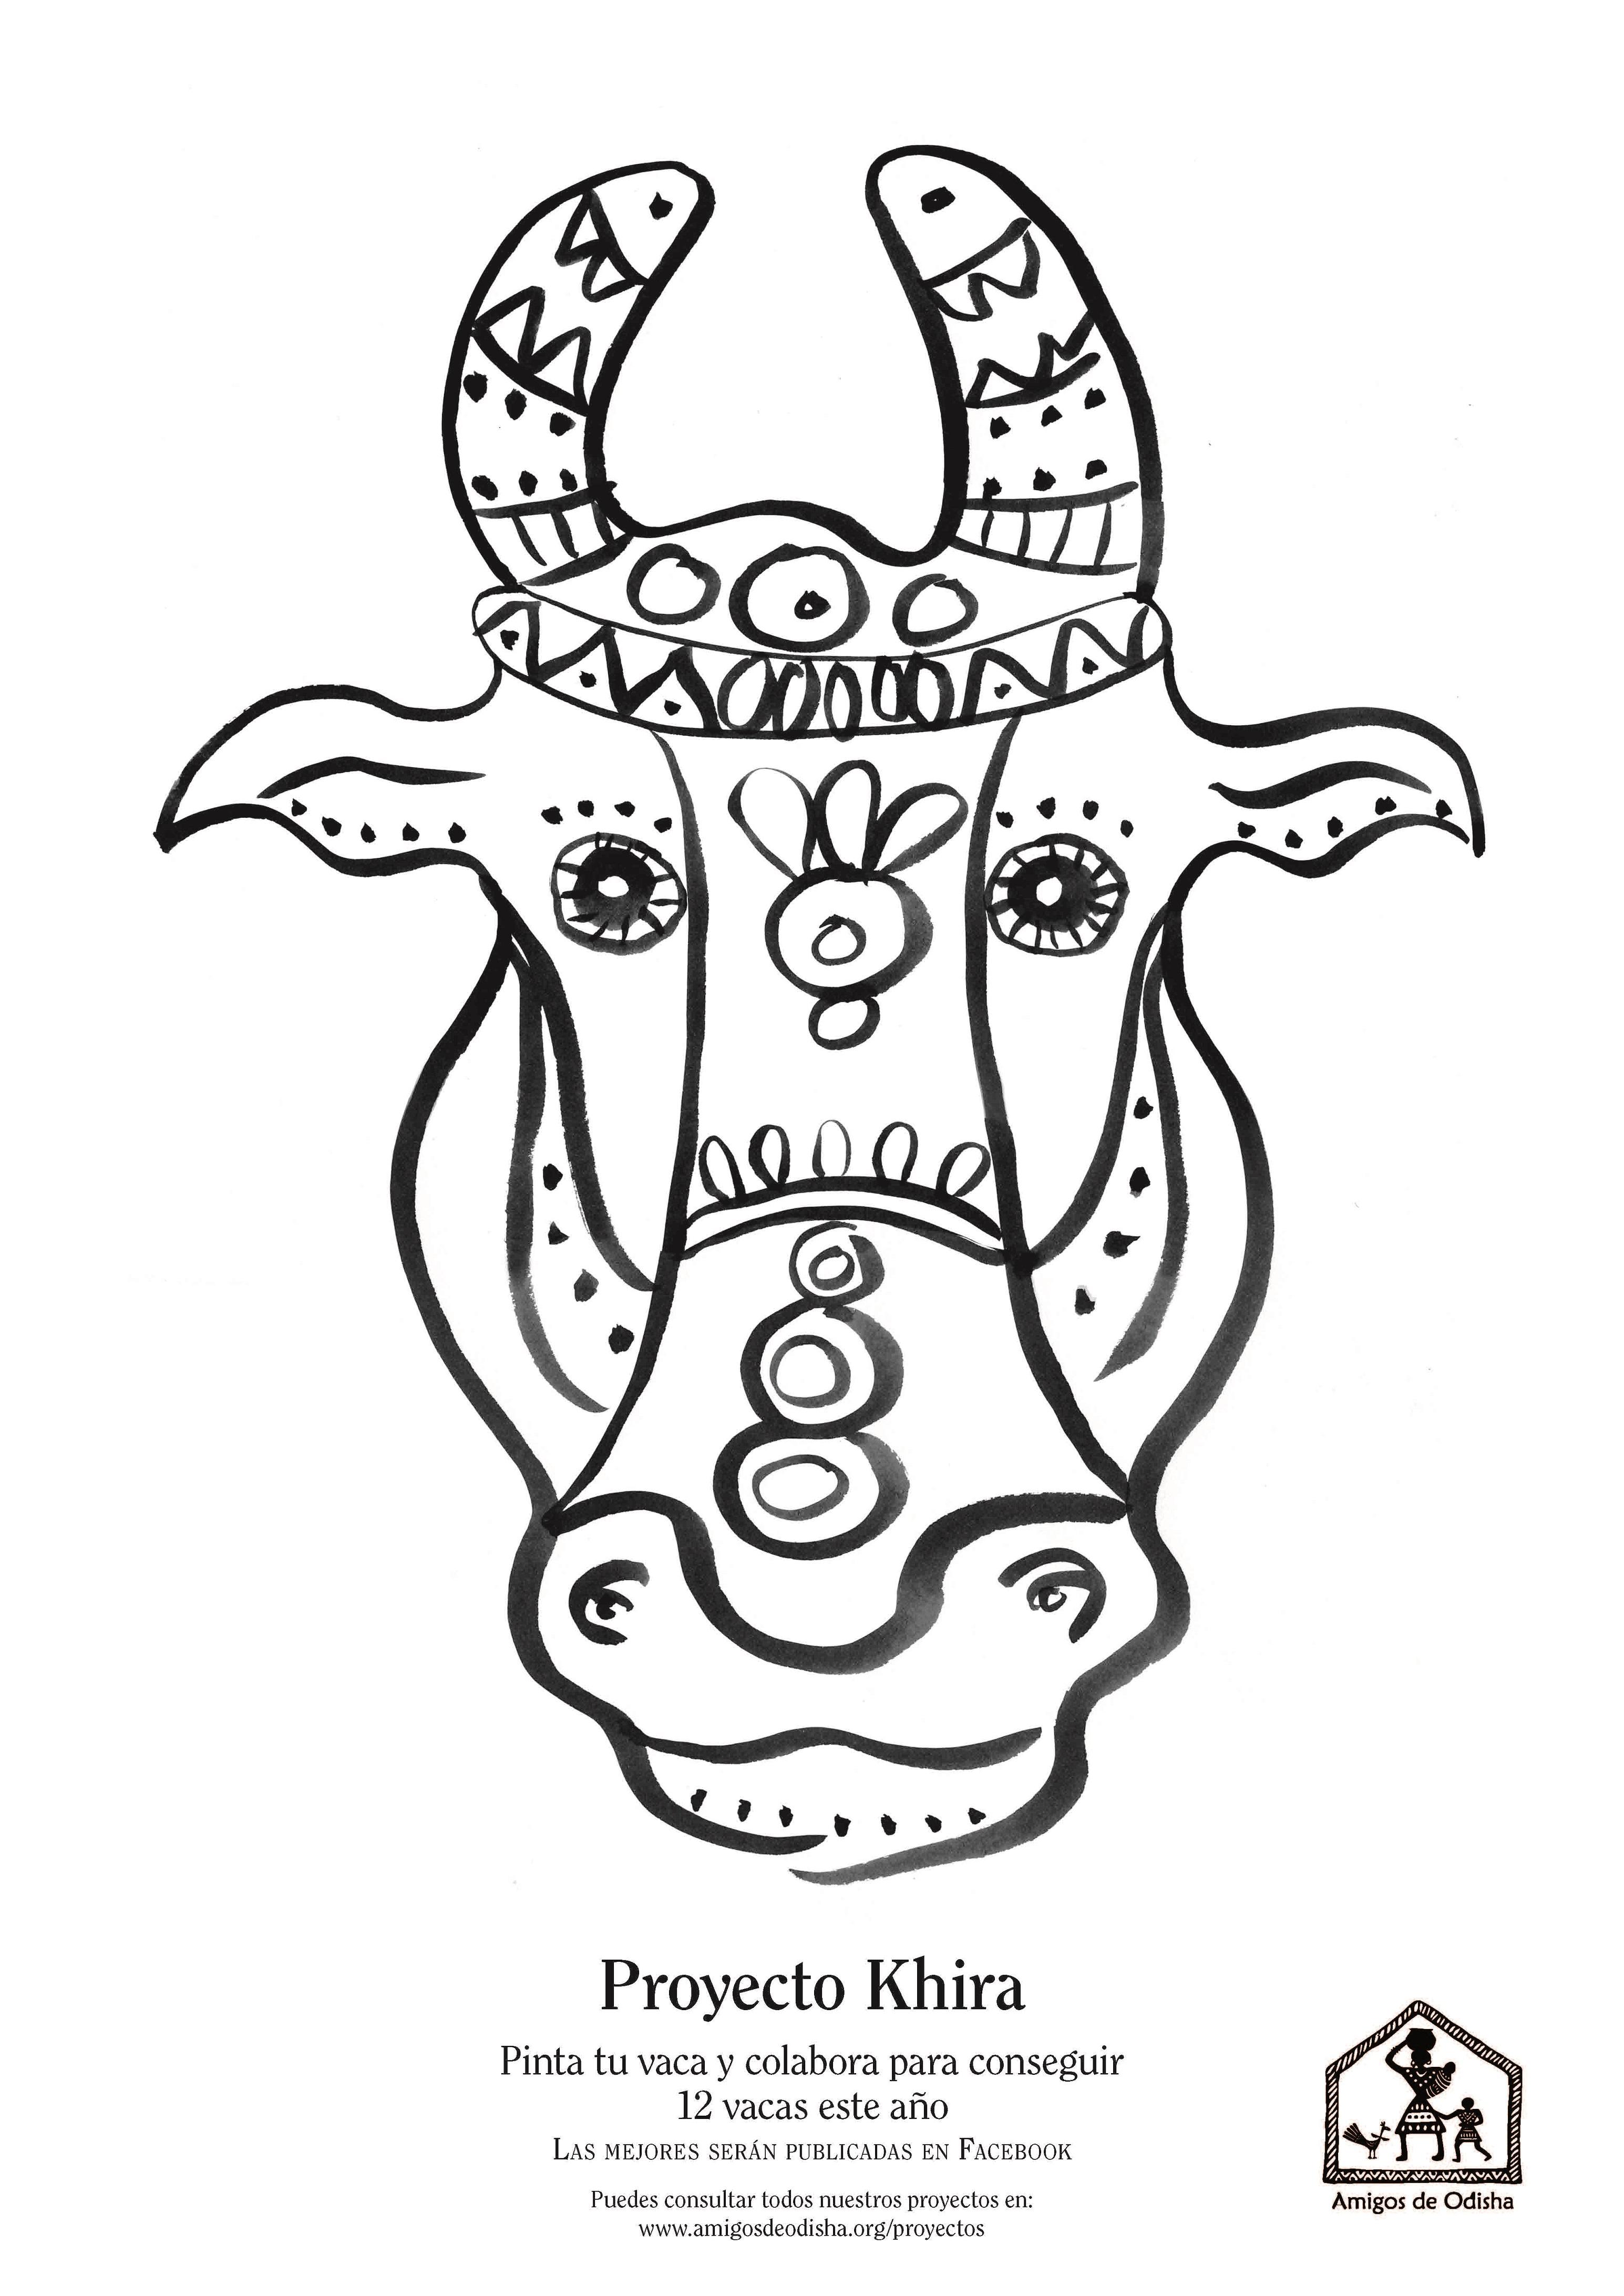 Campaña Pinta tu vaca. Proyecto Khira